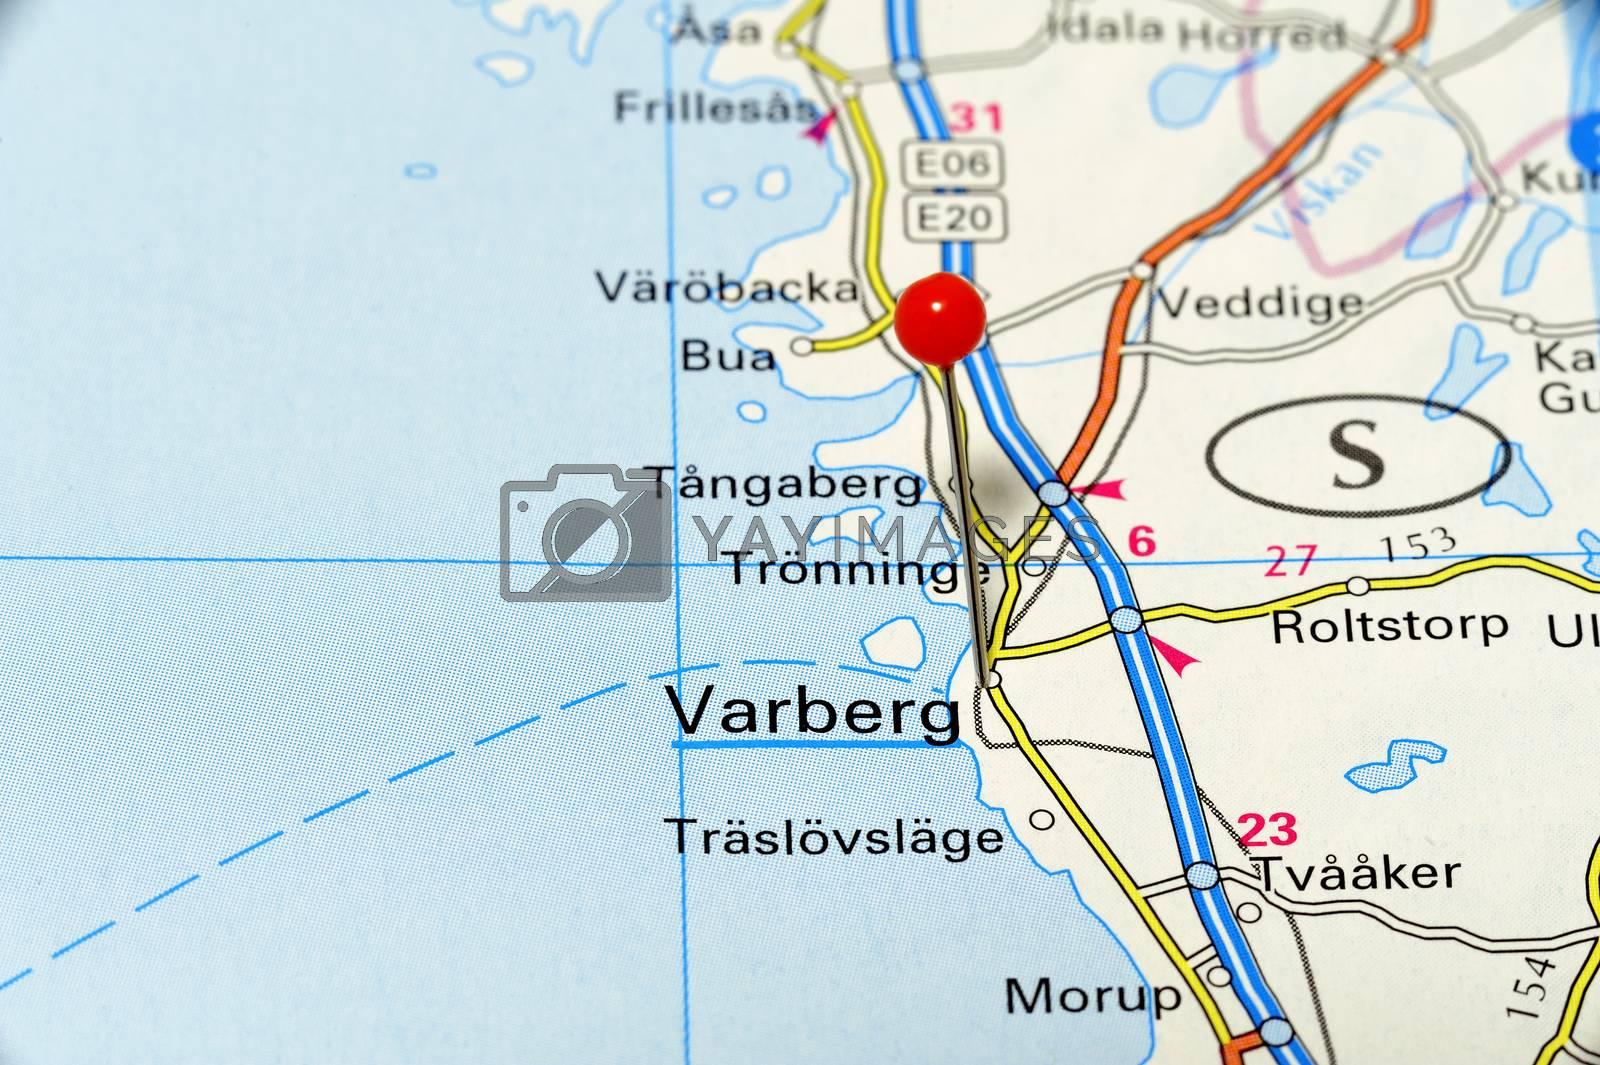 Closeyp map of Varberg. Varberg a city in Sweden